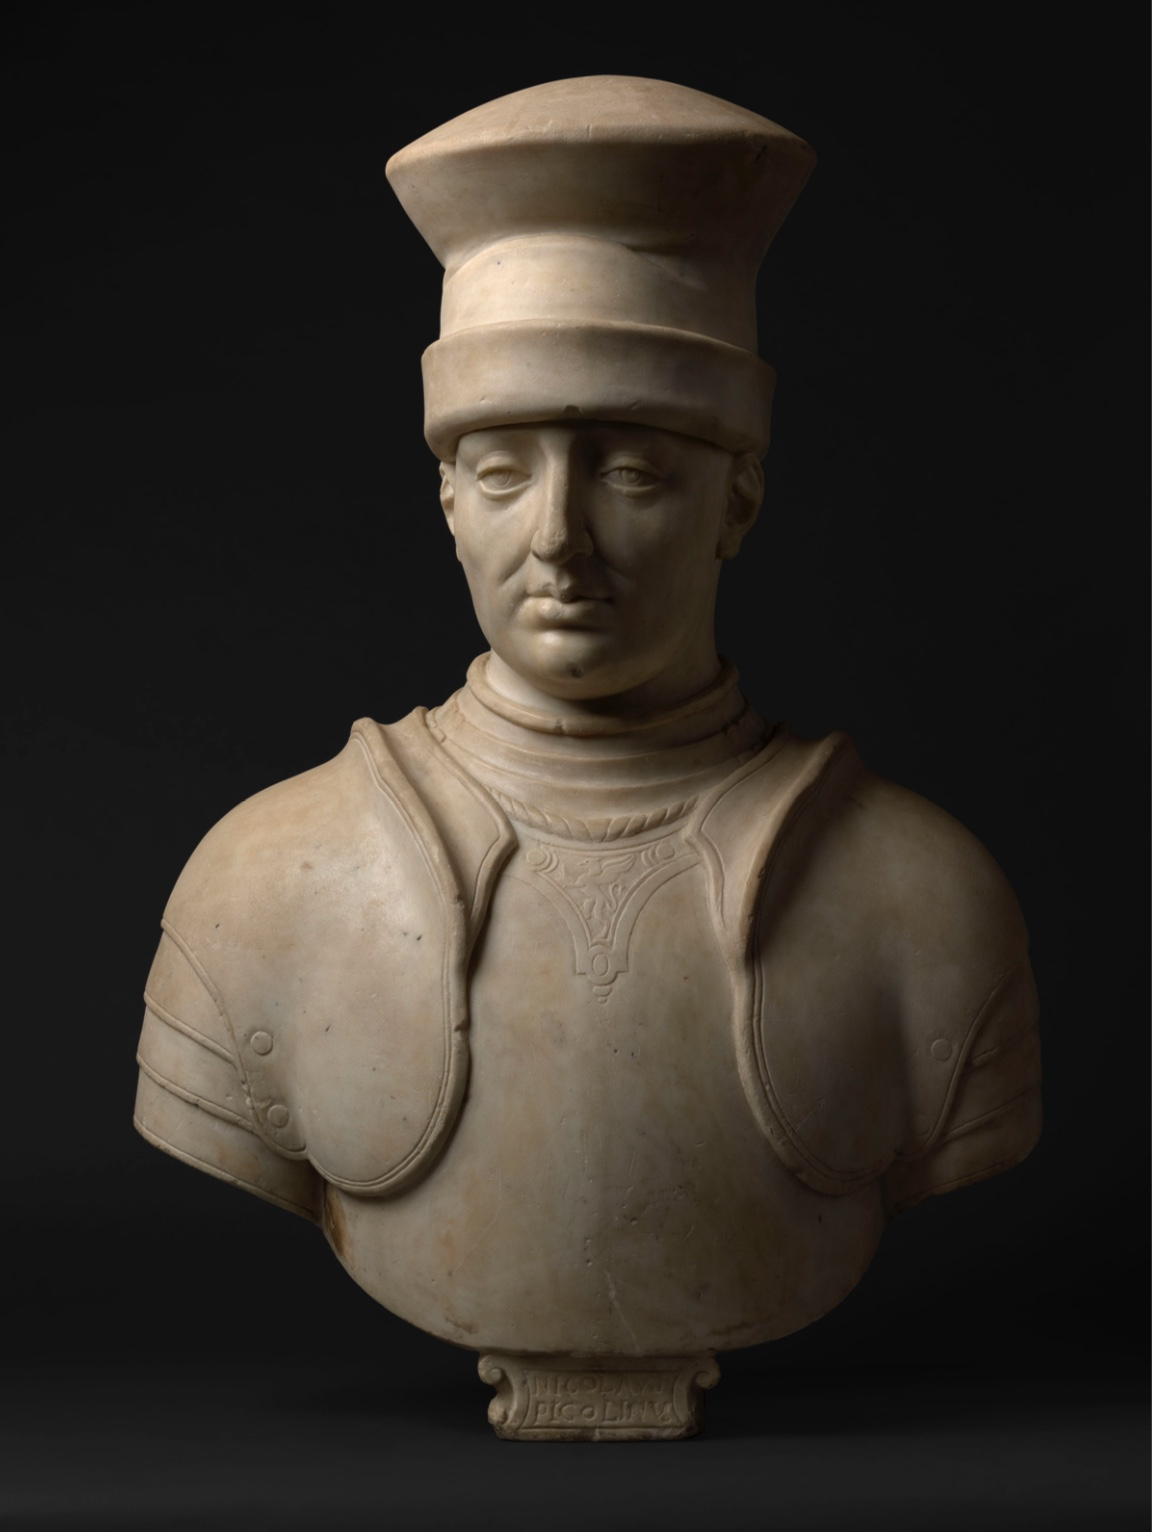 Busto de Niccolò Piccinino – Stoldo Lorenzi